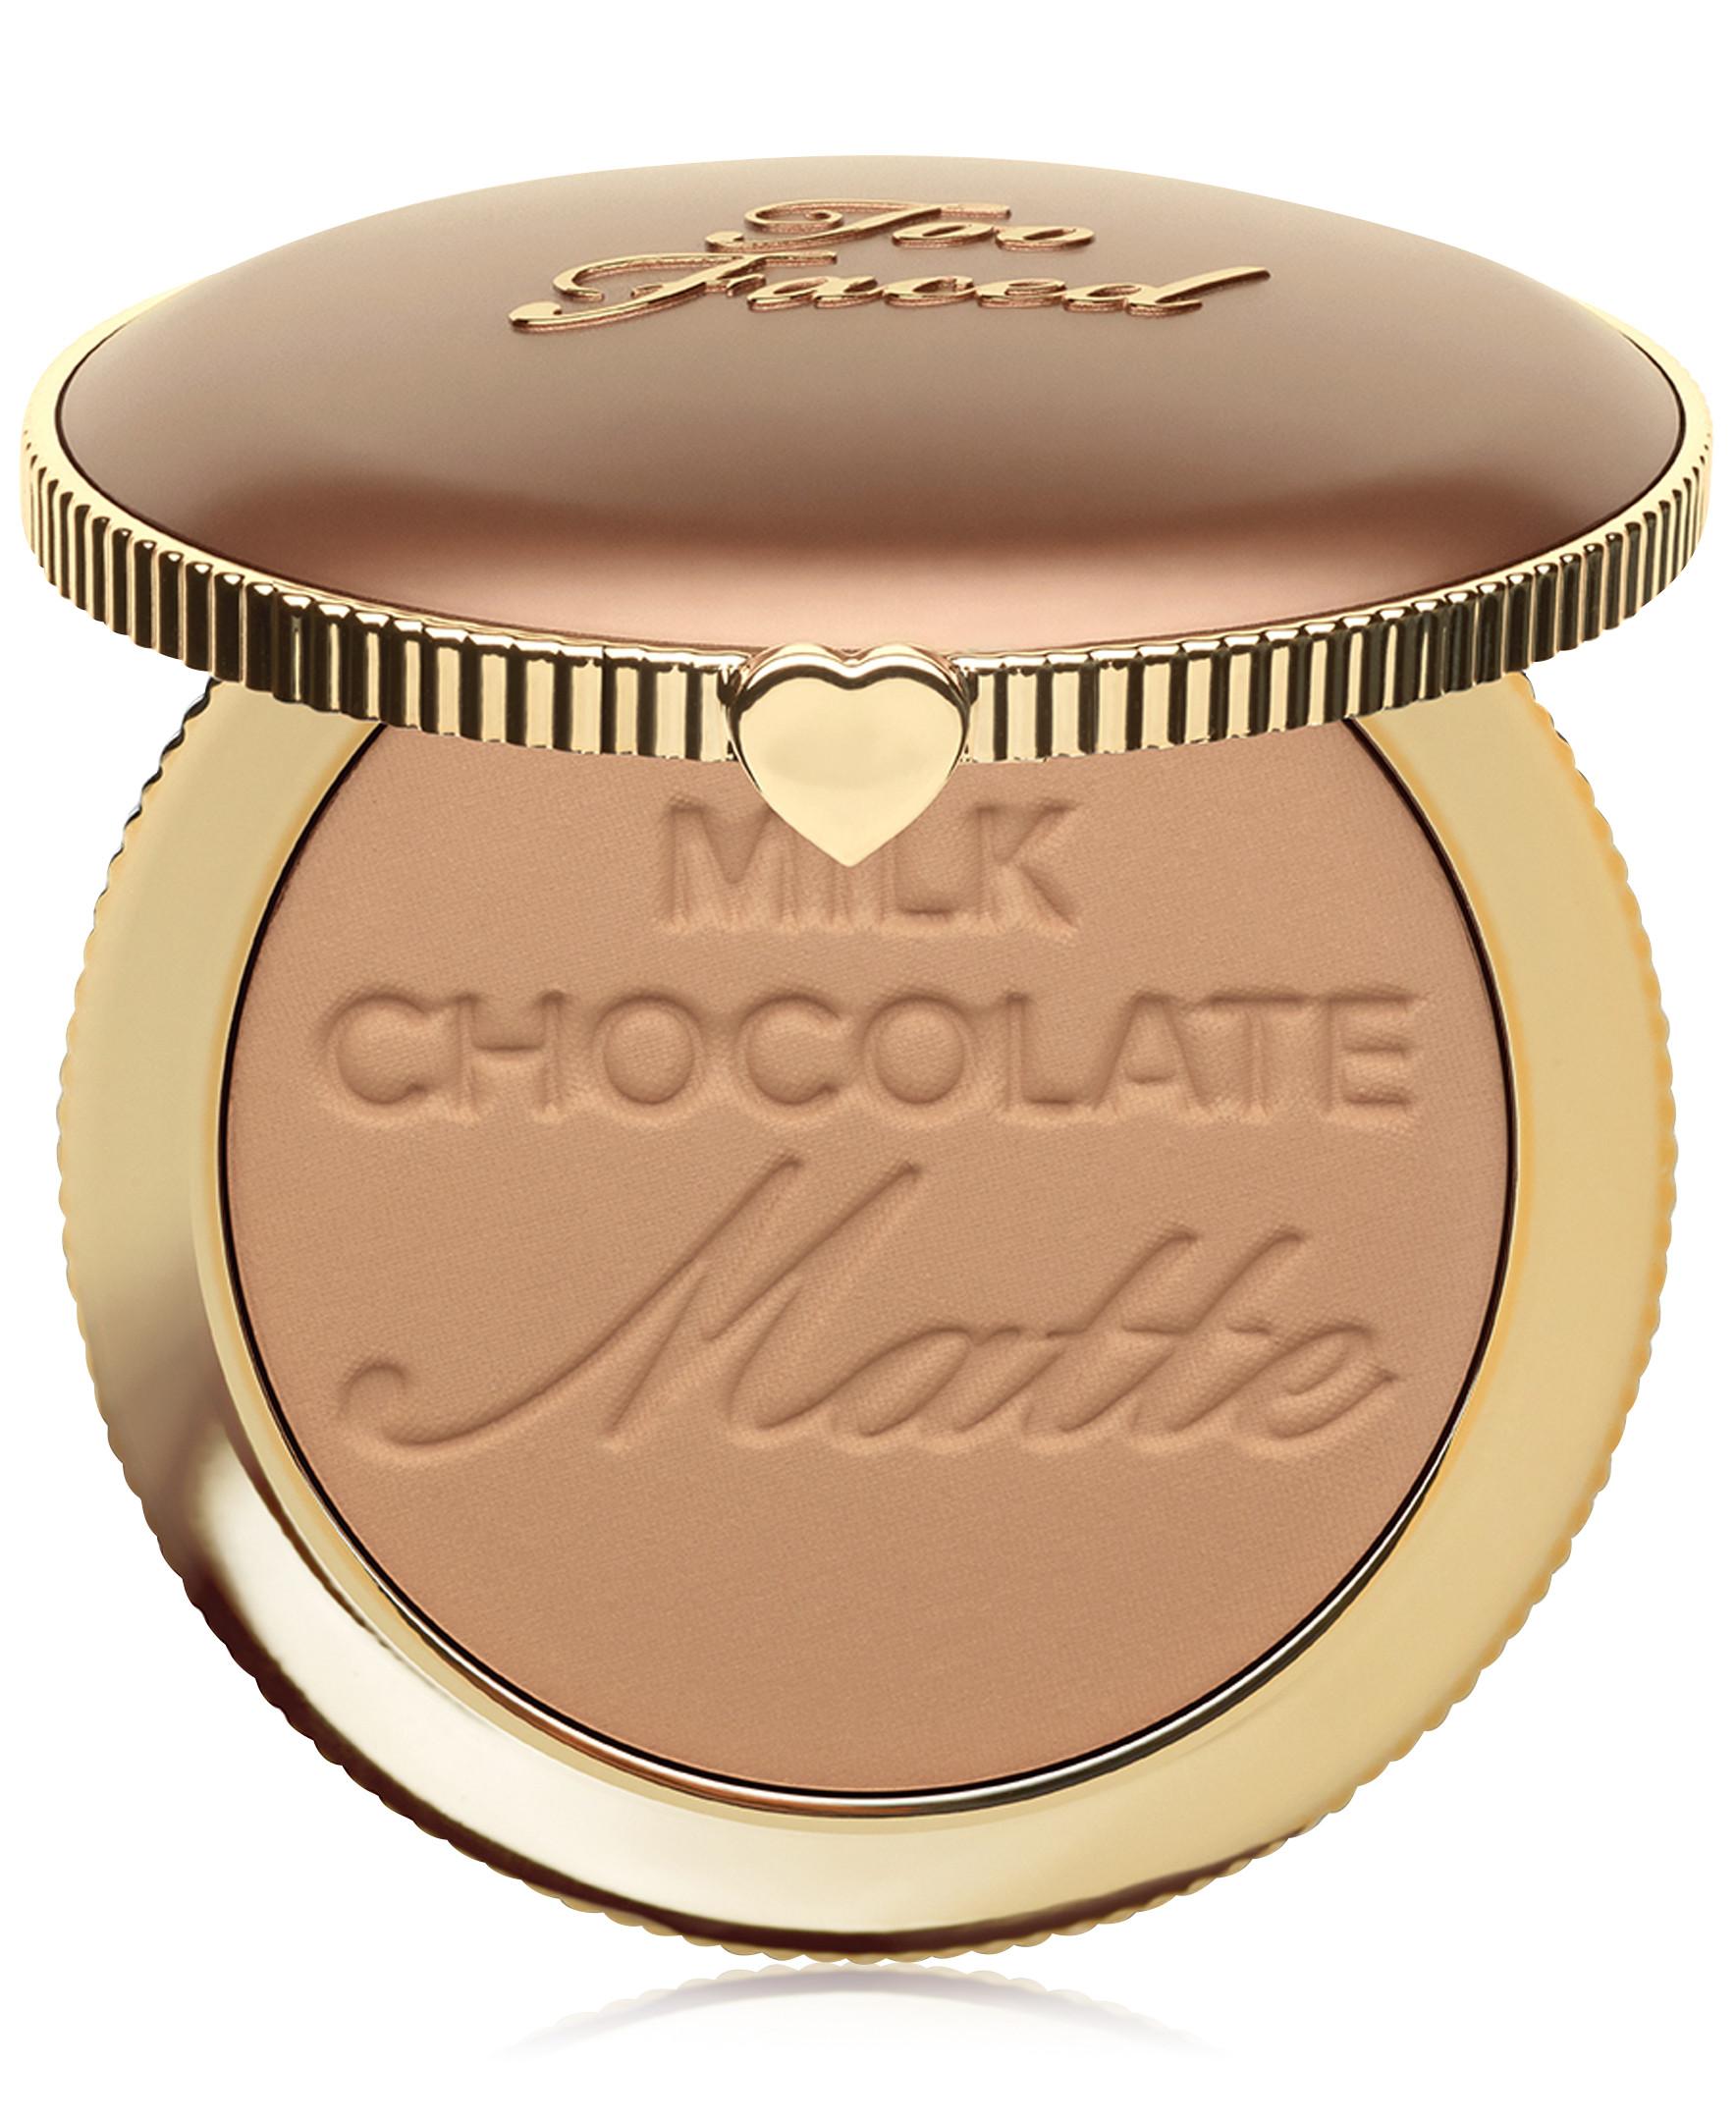 Too Faced Chocolate Soleil Bronzer - $30.00.jpg